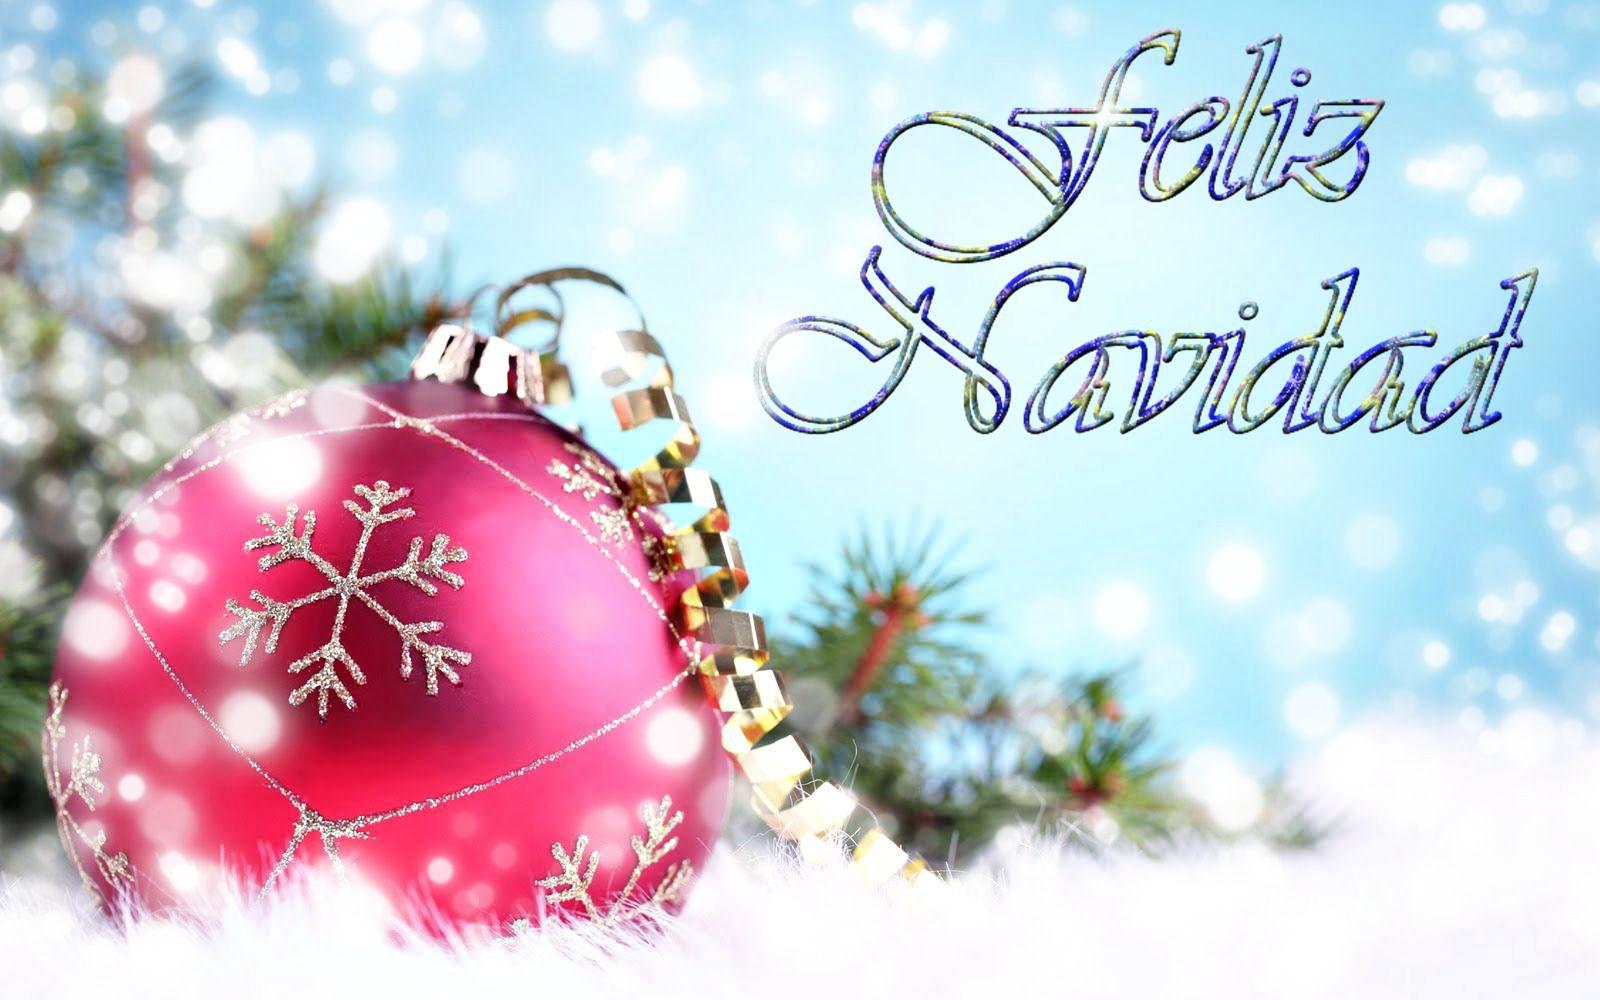 Fondos De Pantalla Para Navidad: Wallpapers,fondos Navidad 1600 X 1200